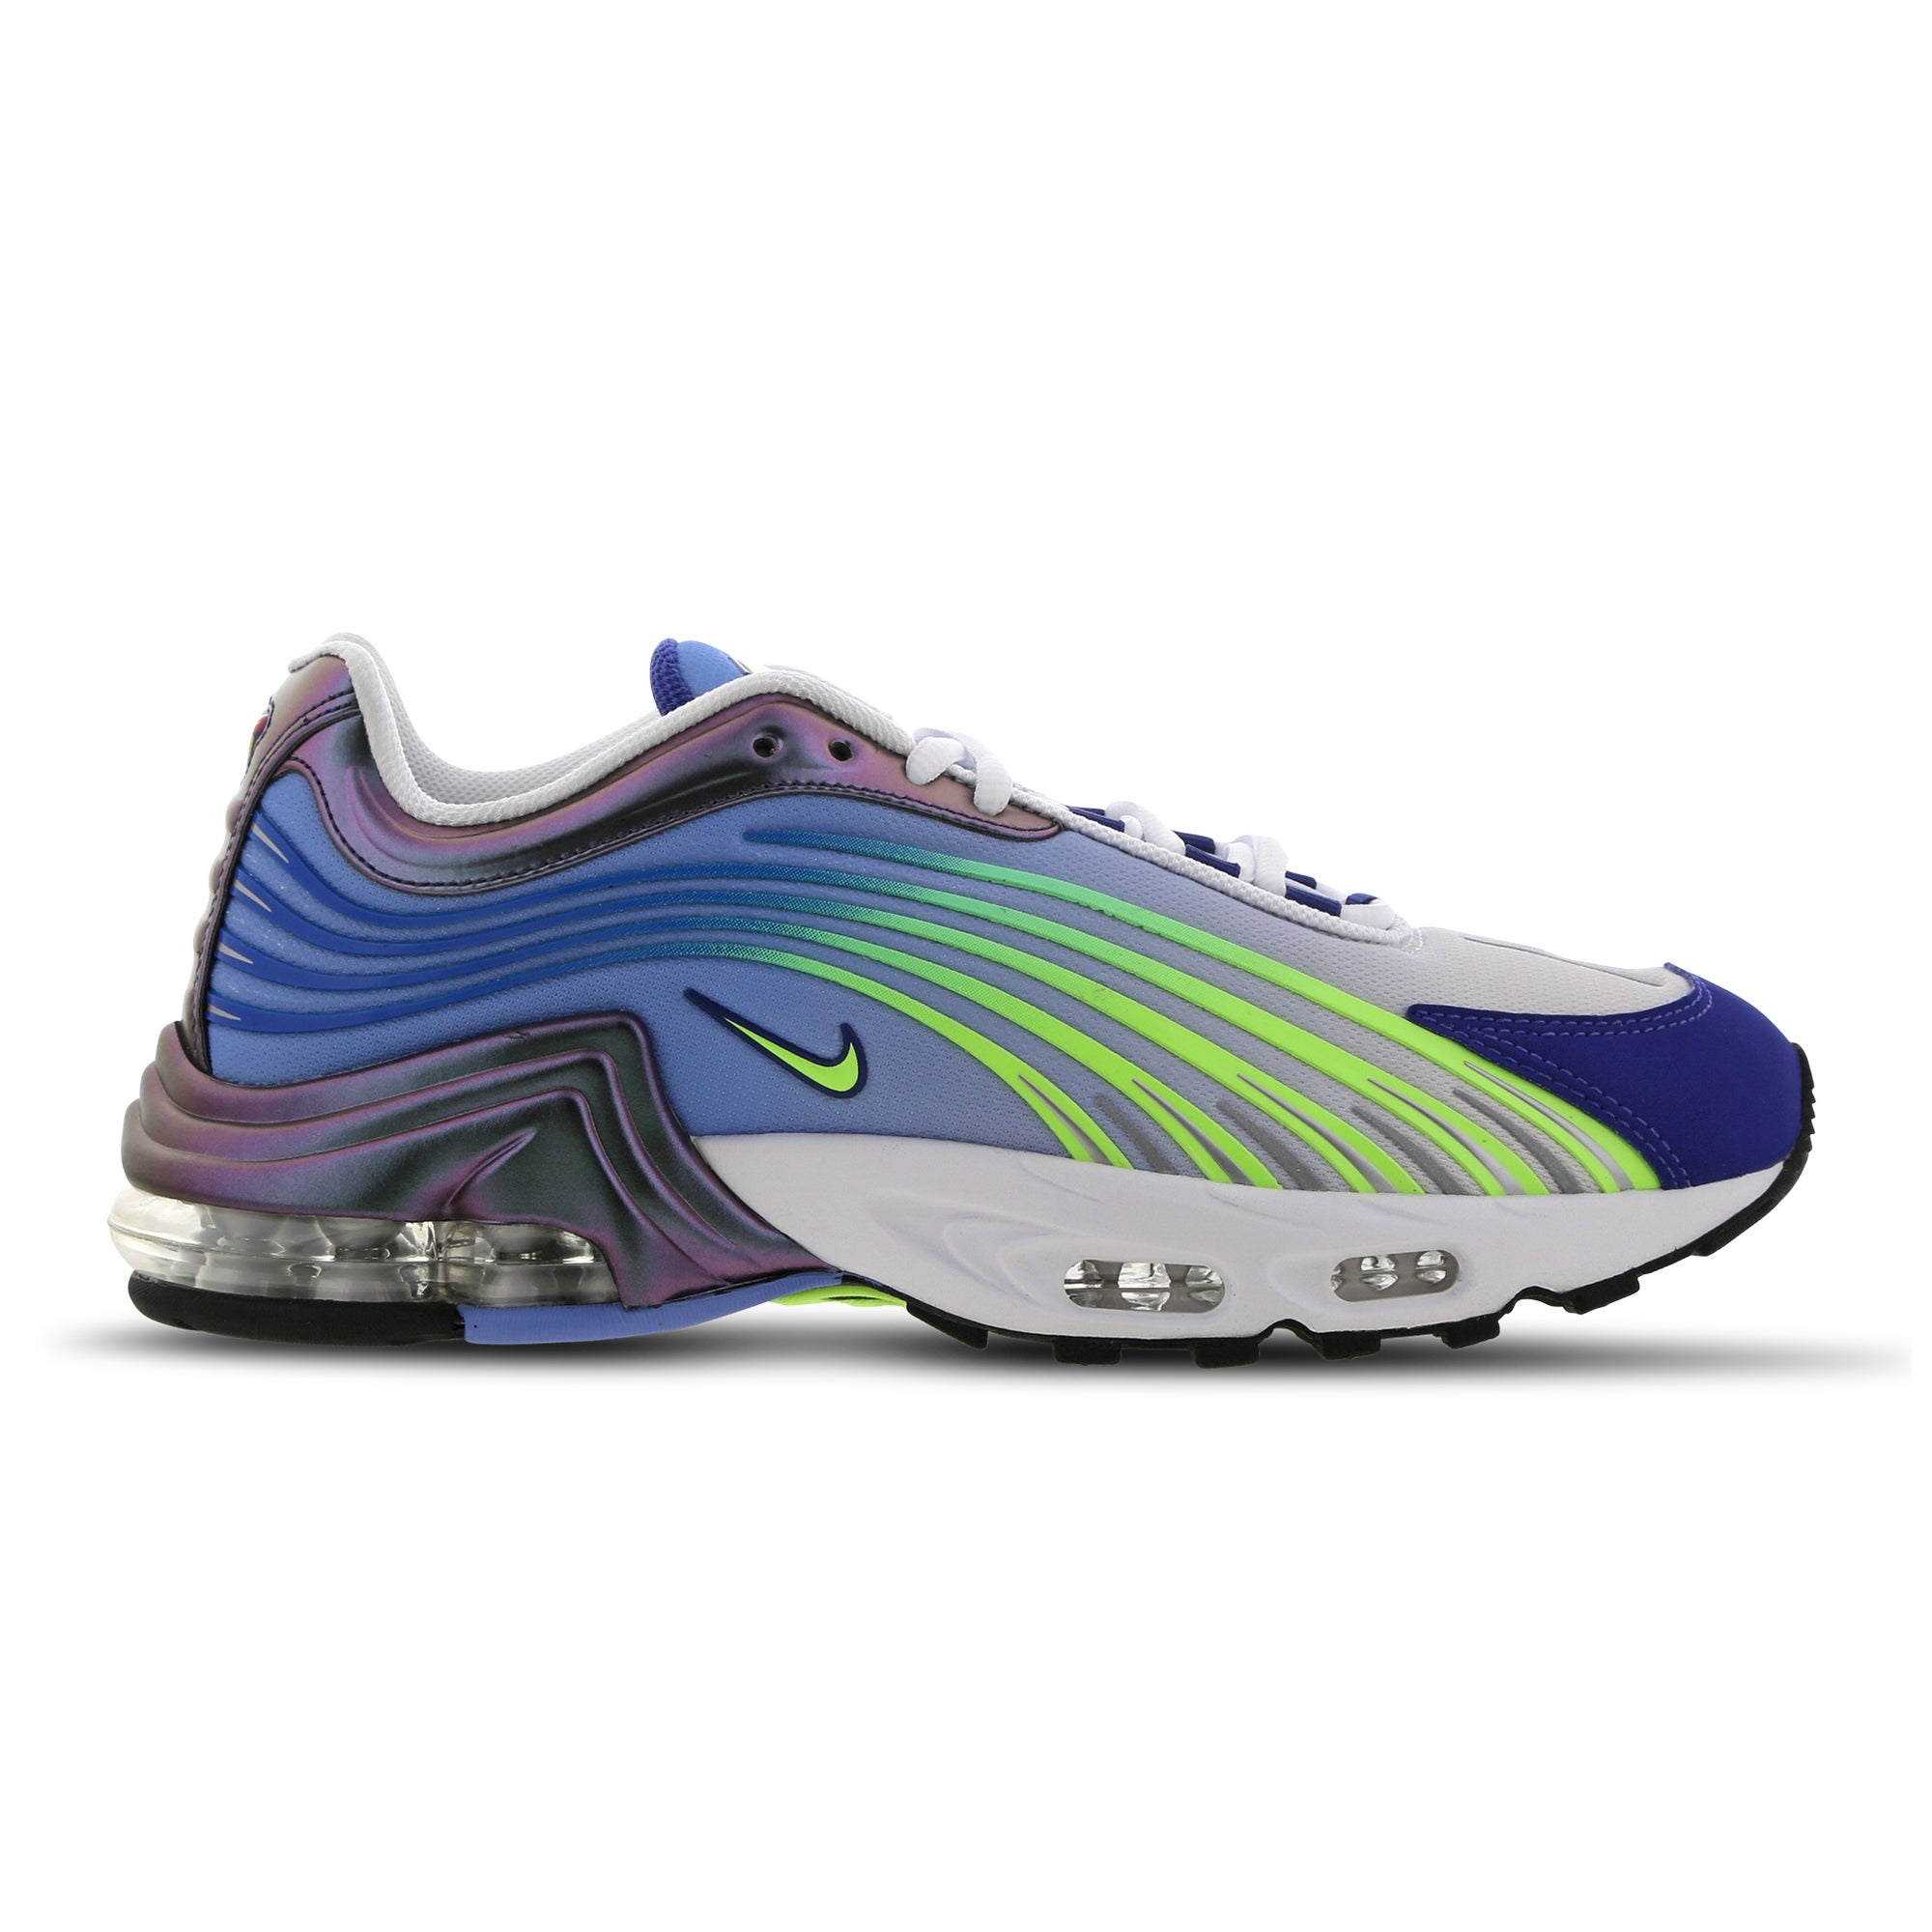 Nike Tuned 2 Shoes